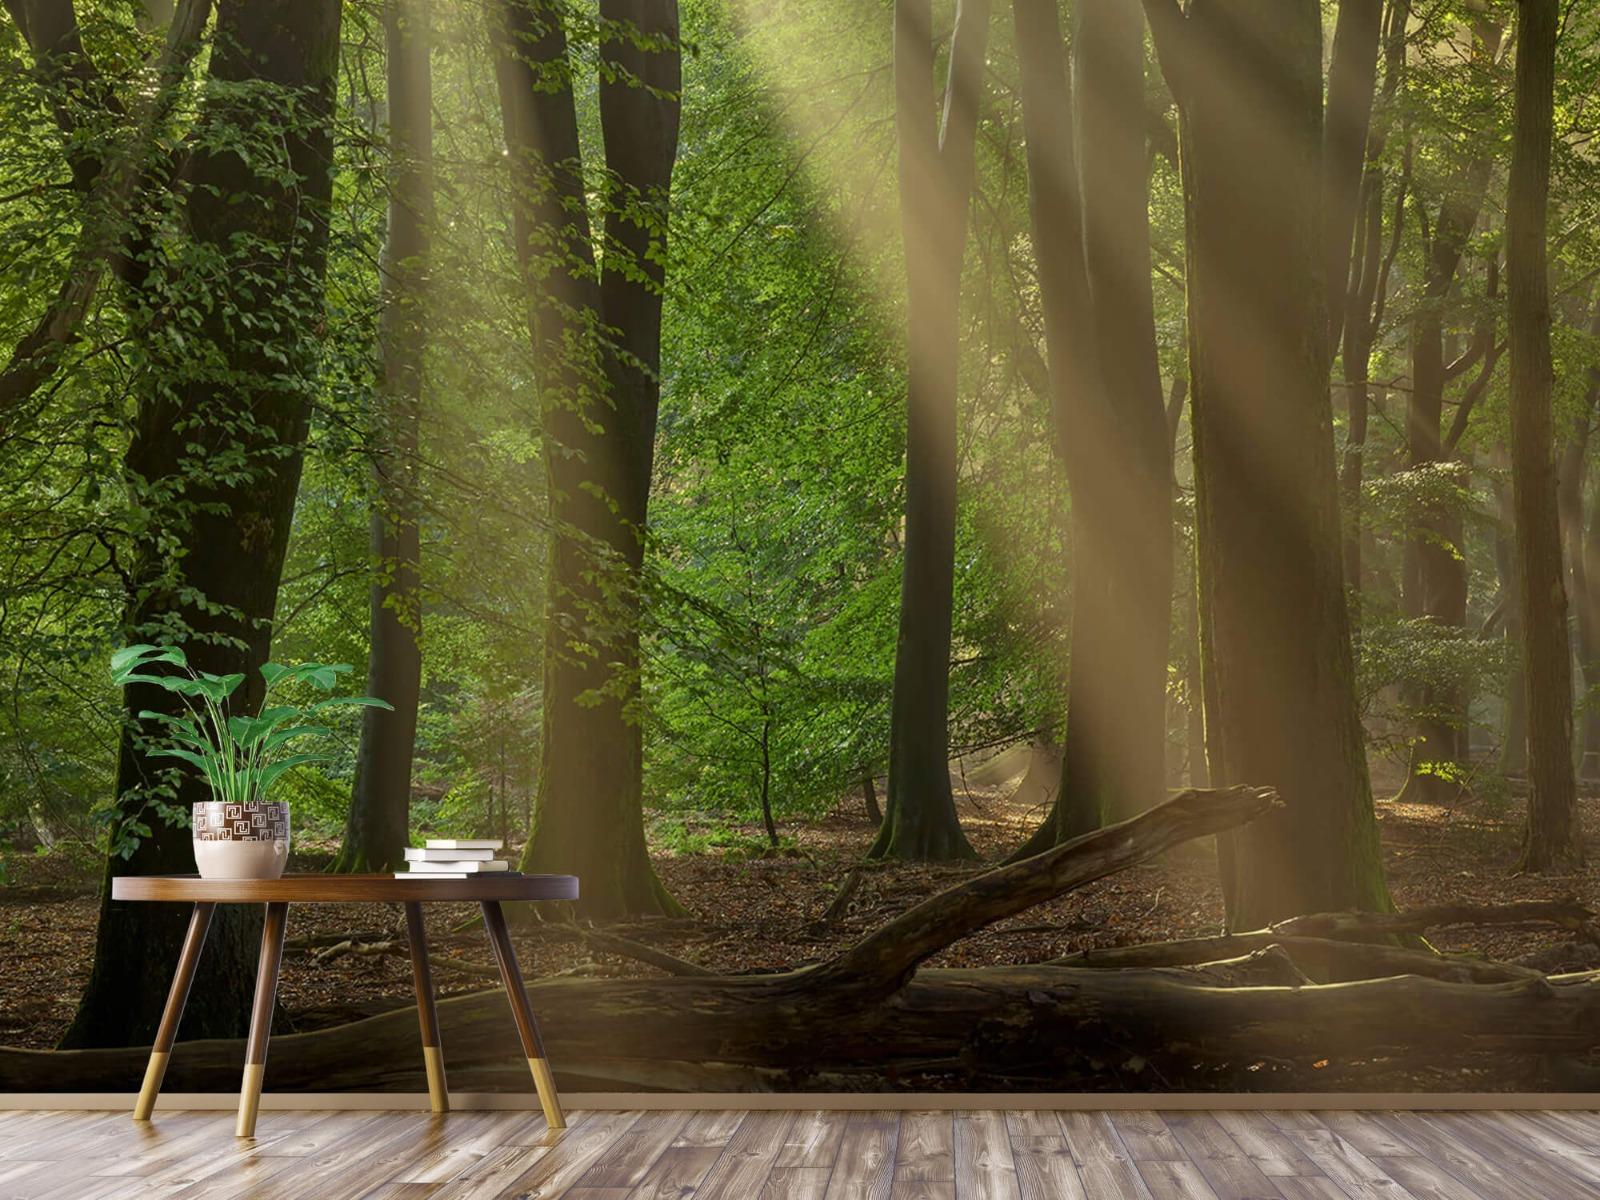 Bomen - Zonneharpen in het bos - Slaapkamer 1